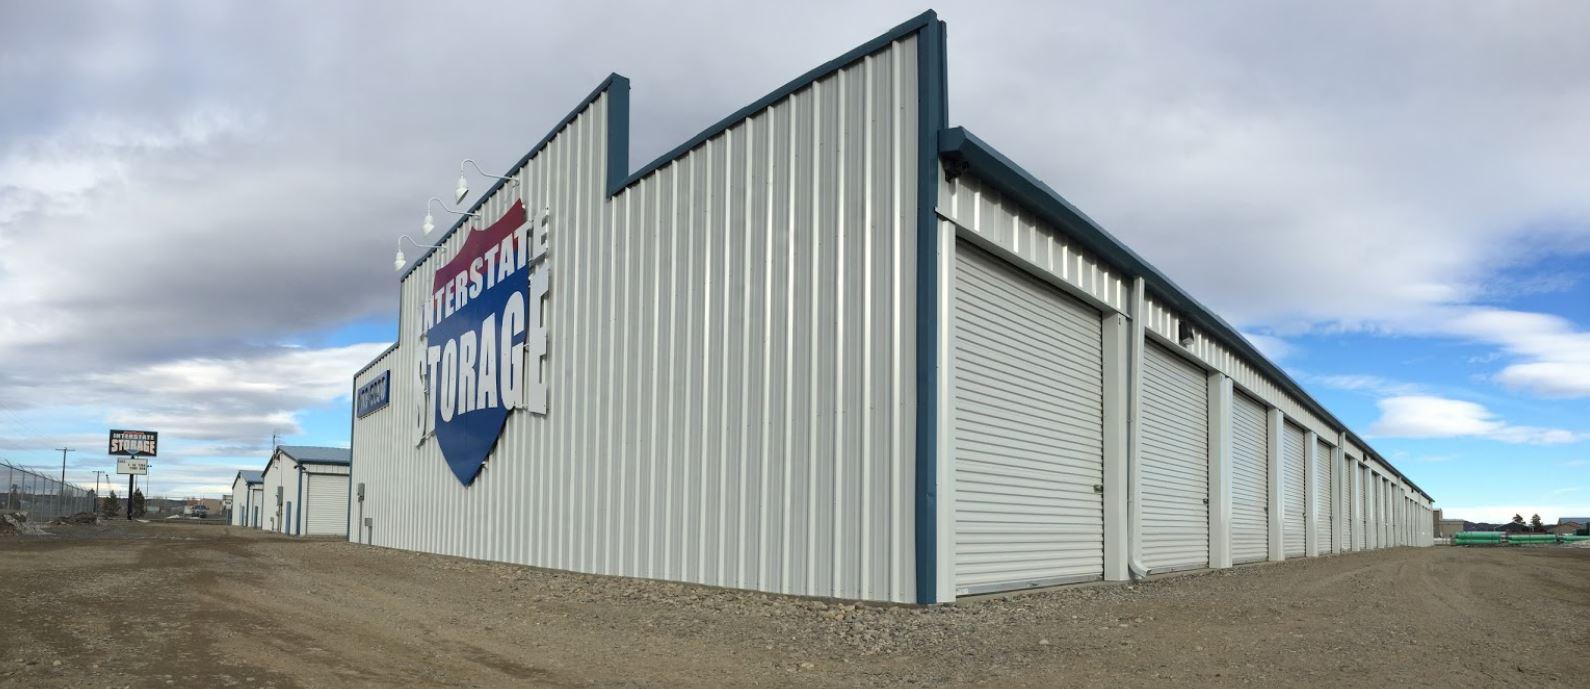 Interstate Storage Billings, MT